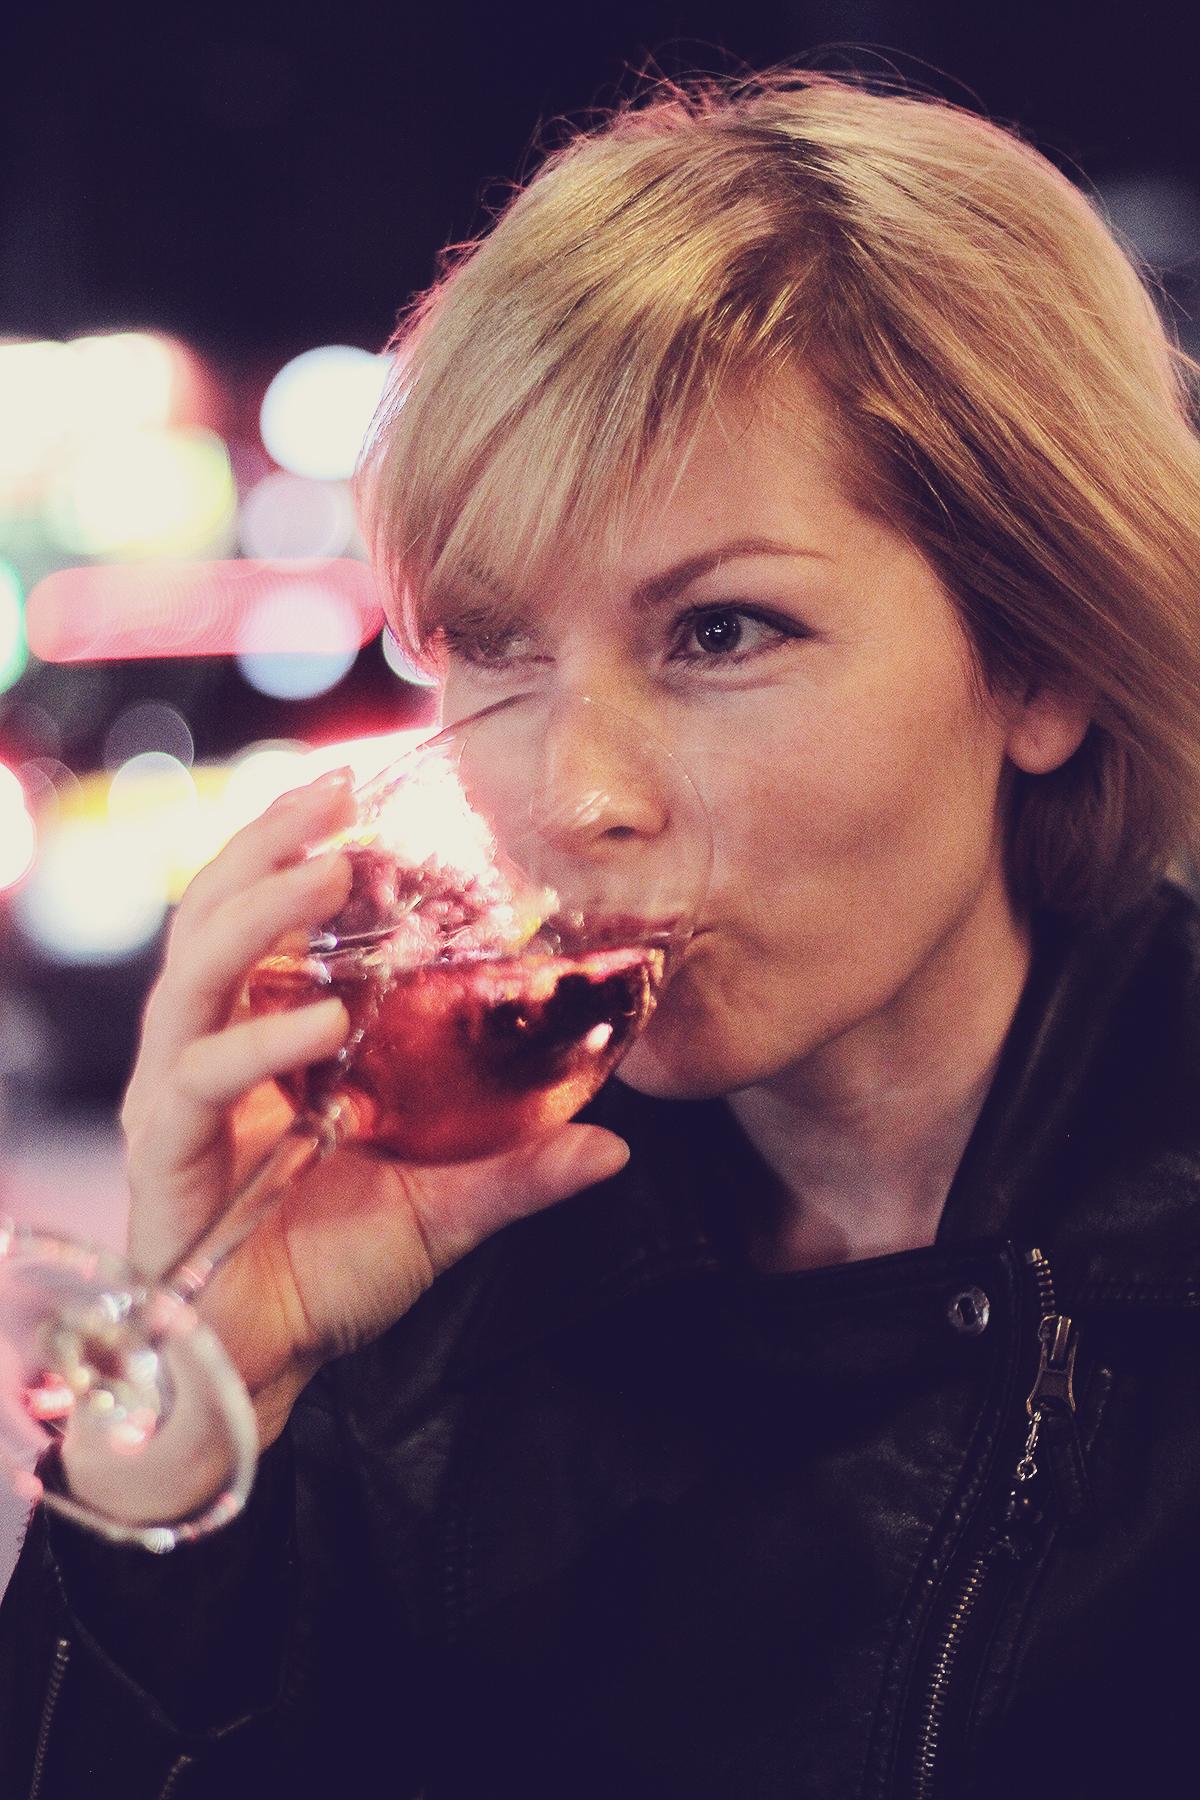 london-drinks-in-notting-hill